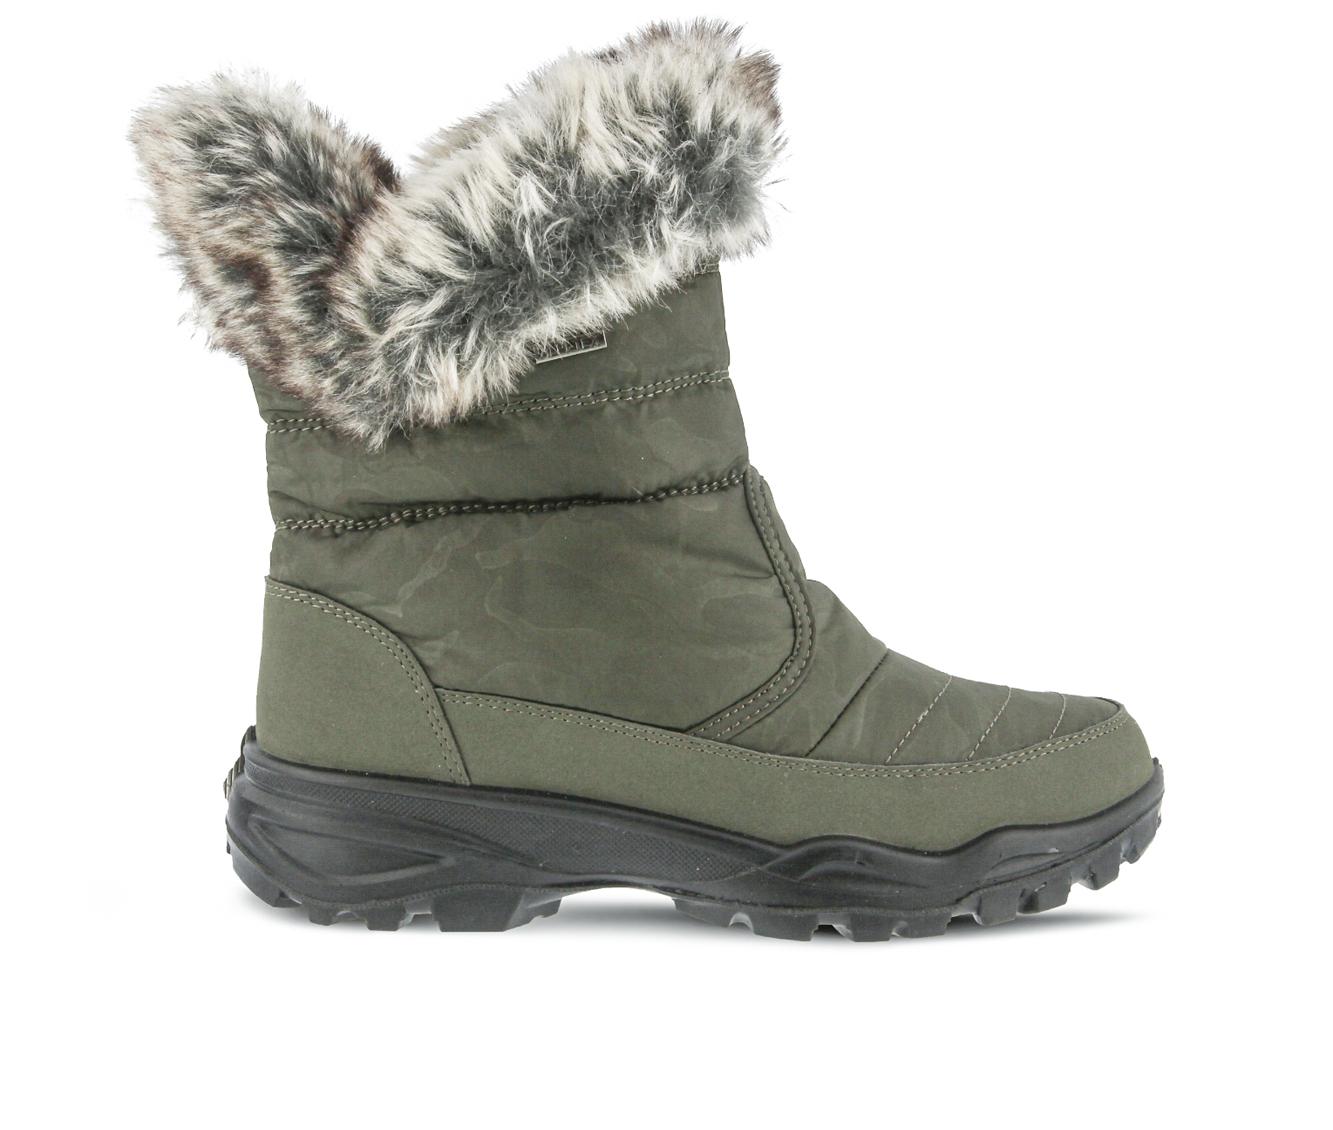 Flexus Korine Women's Boots (Green Canvas)